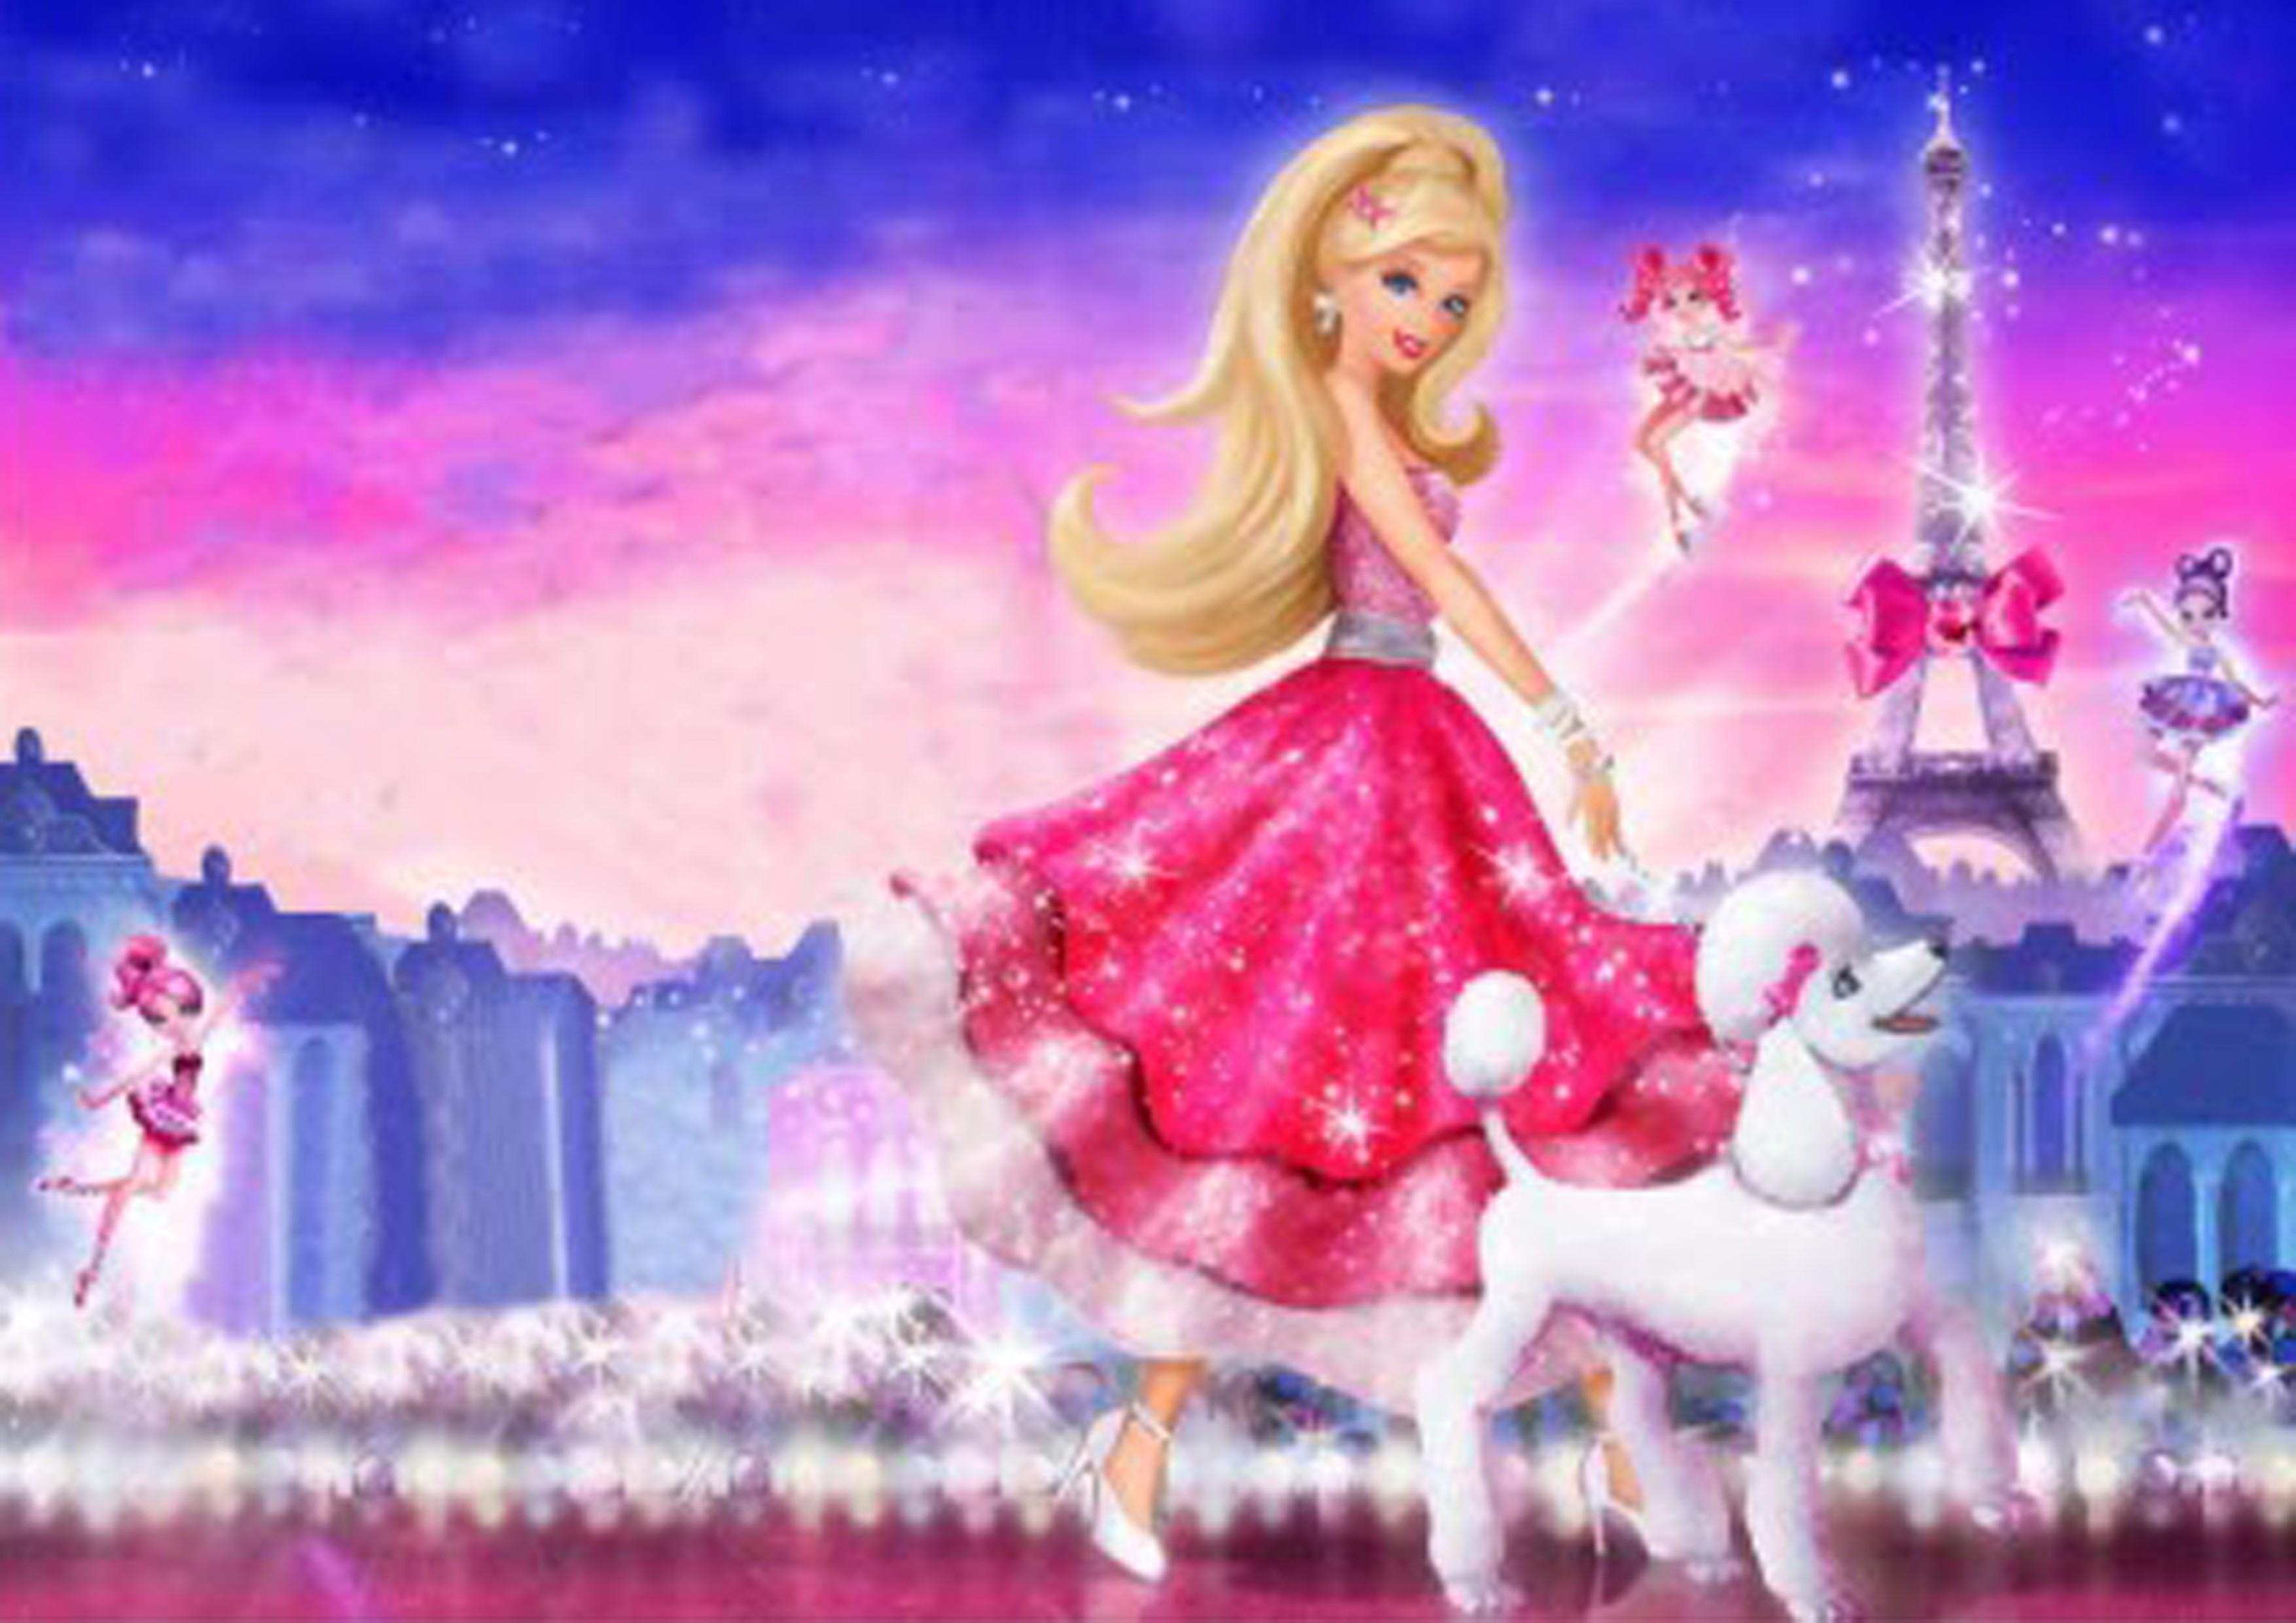 19 Barbie Wallpaper By Joaquin Gaspero FreshWallpapersZone